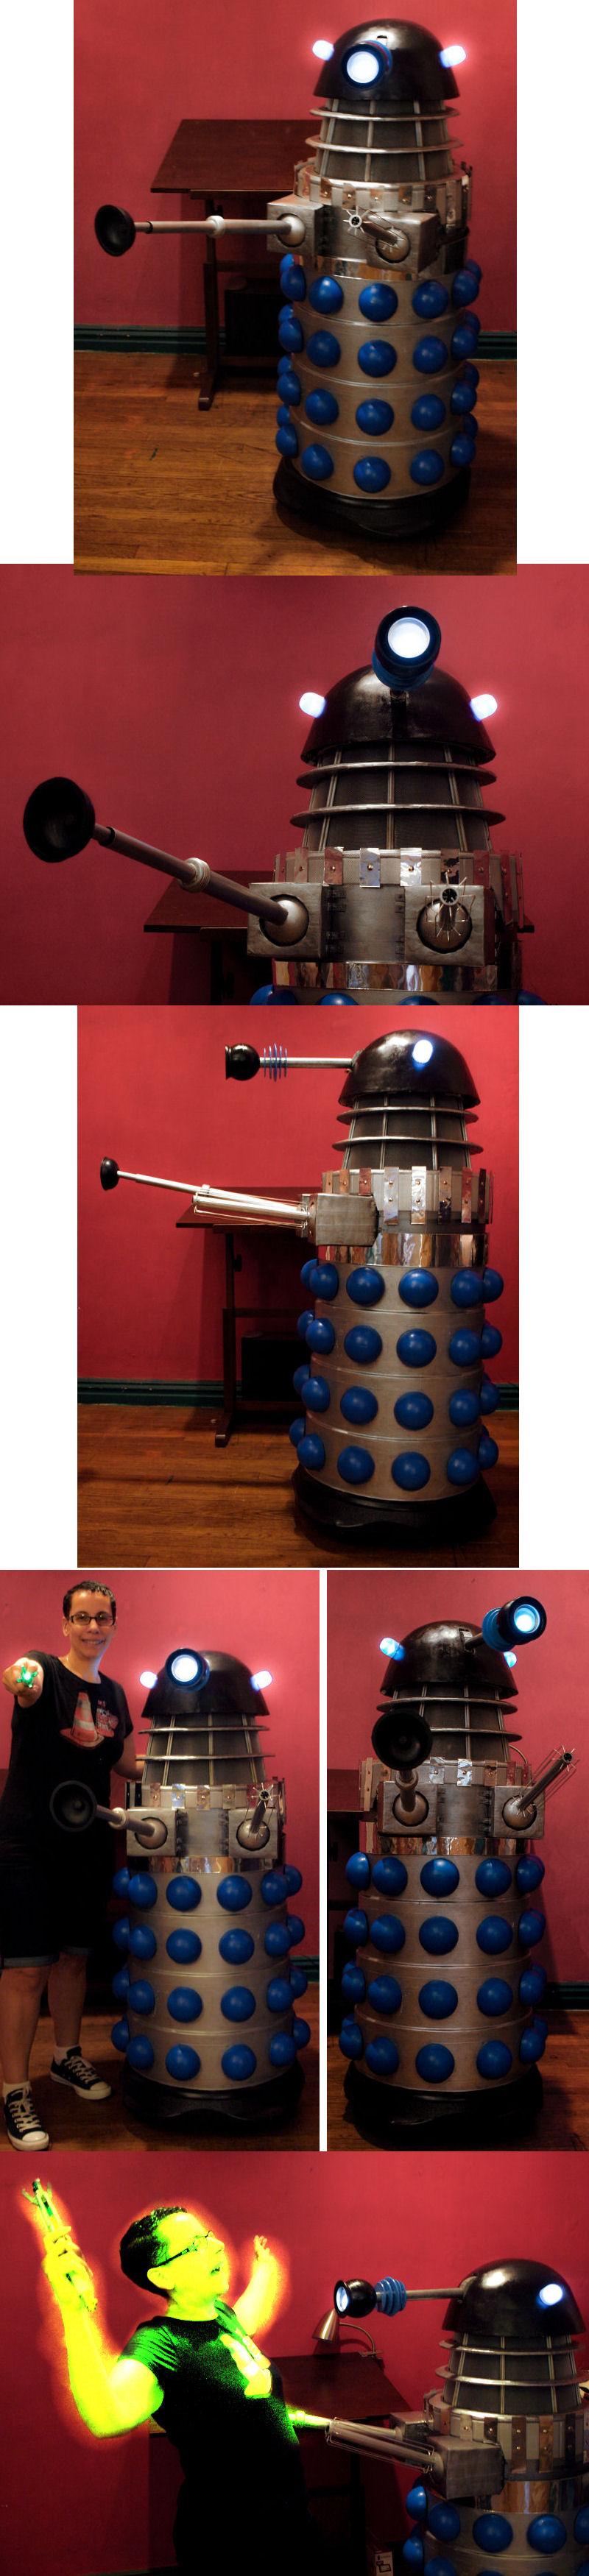 Finished Dalek by ajldesign